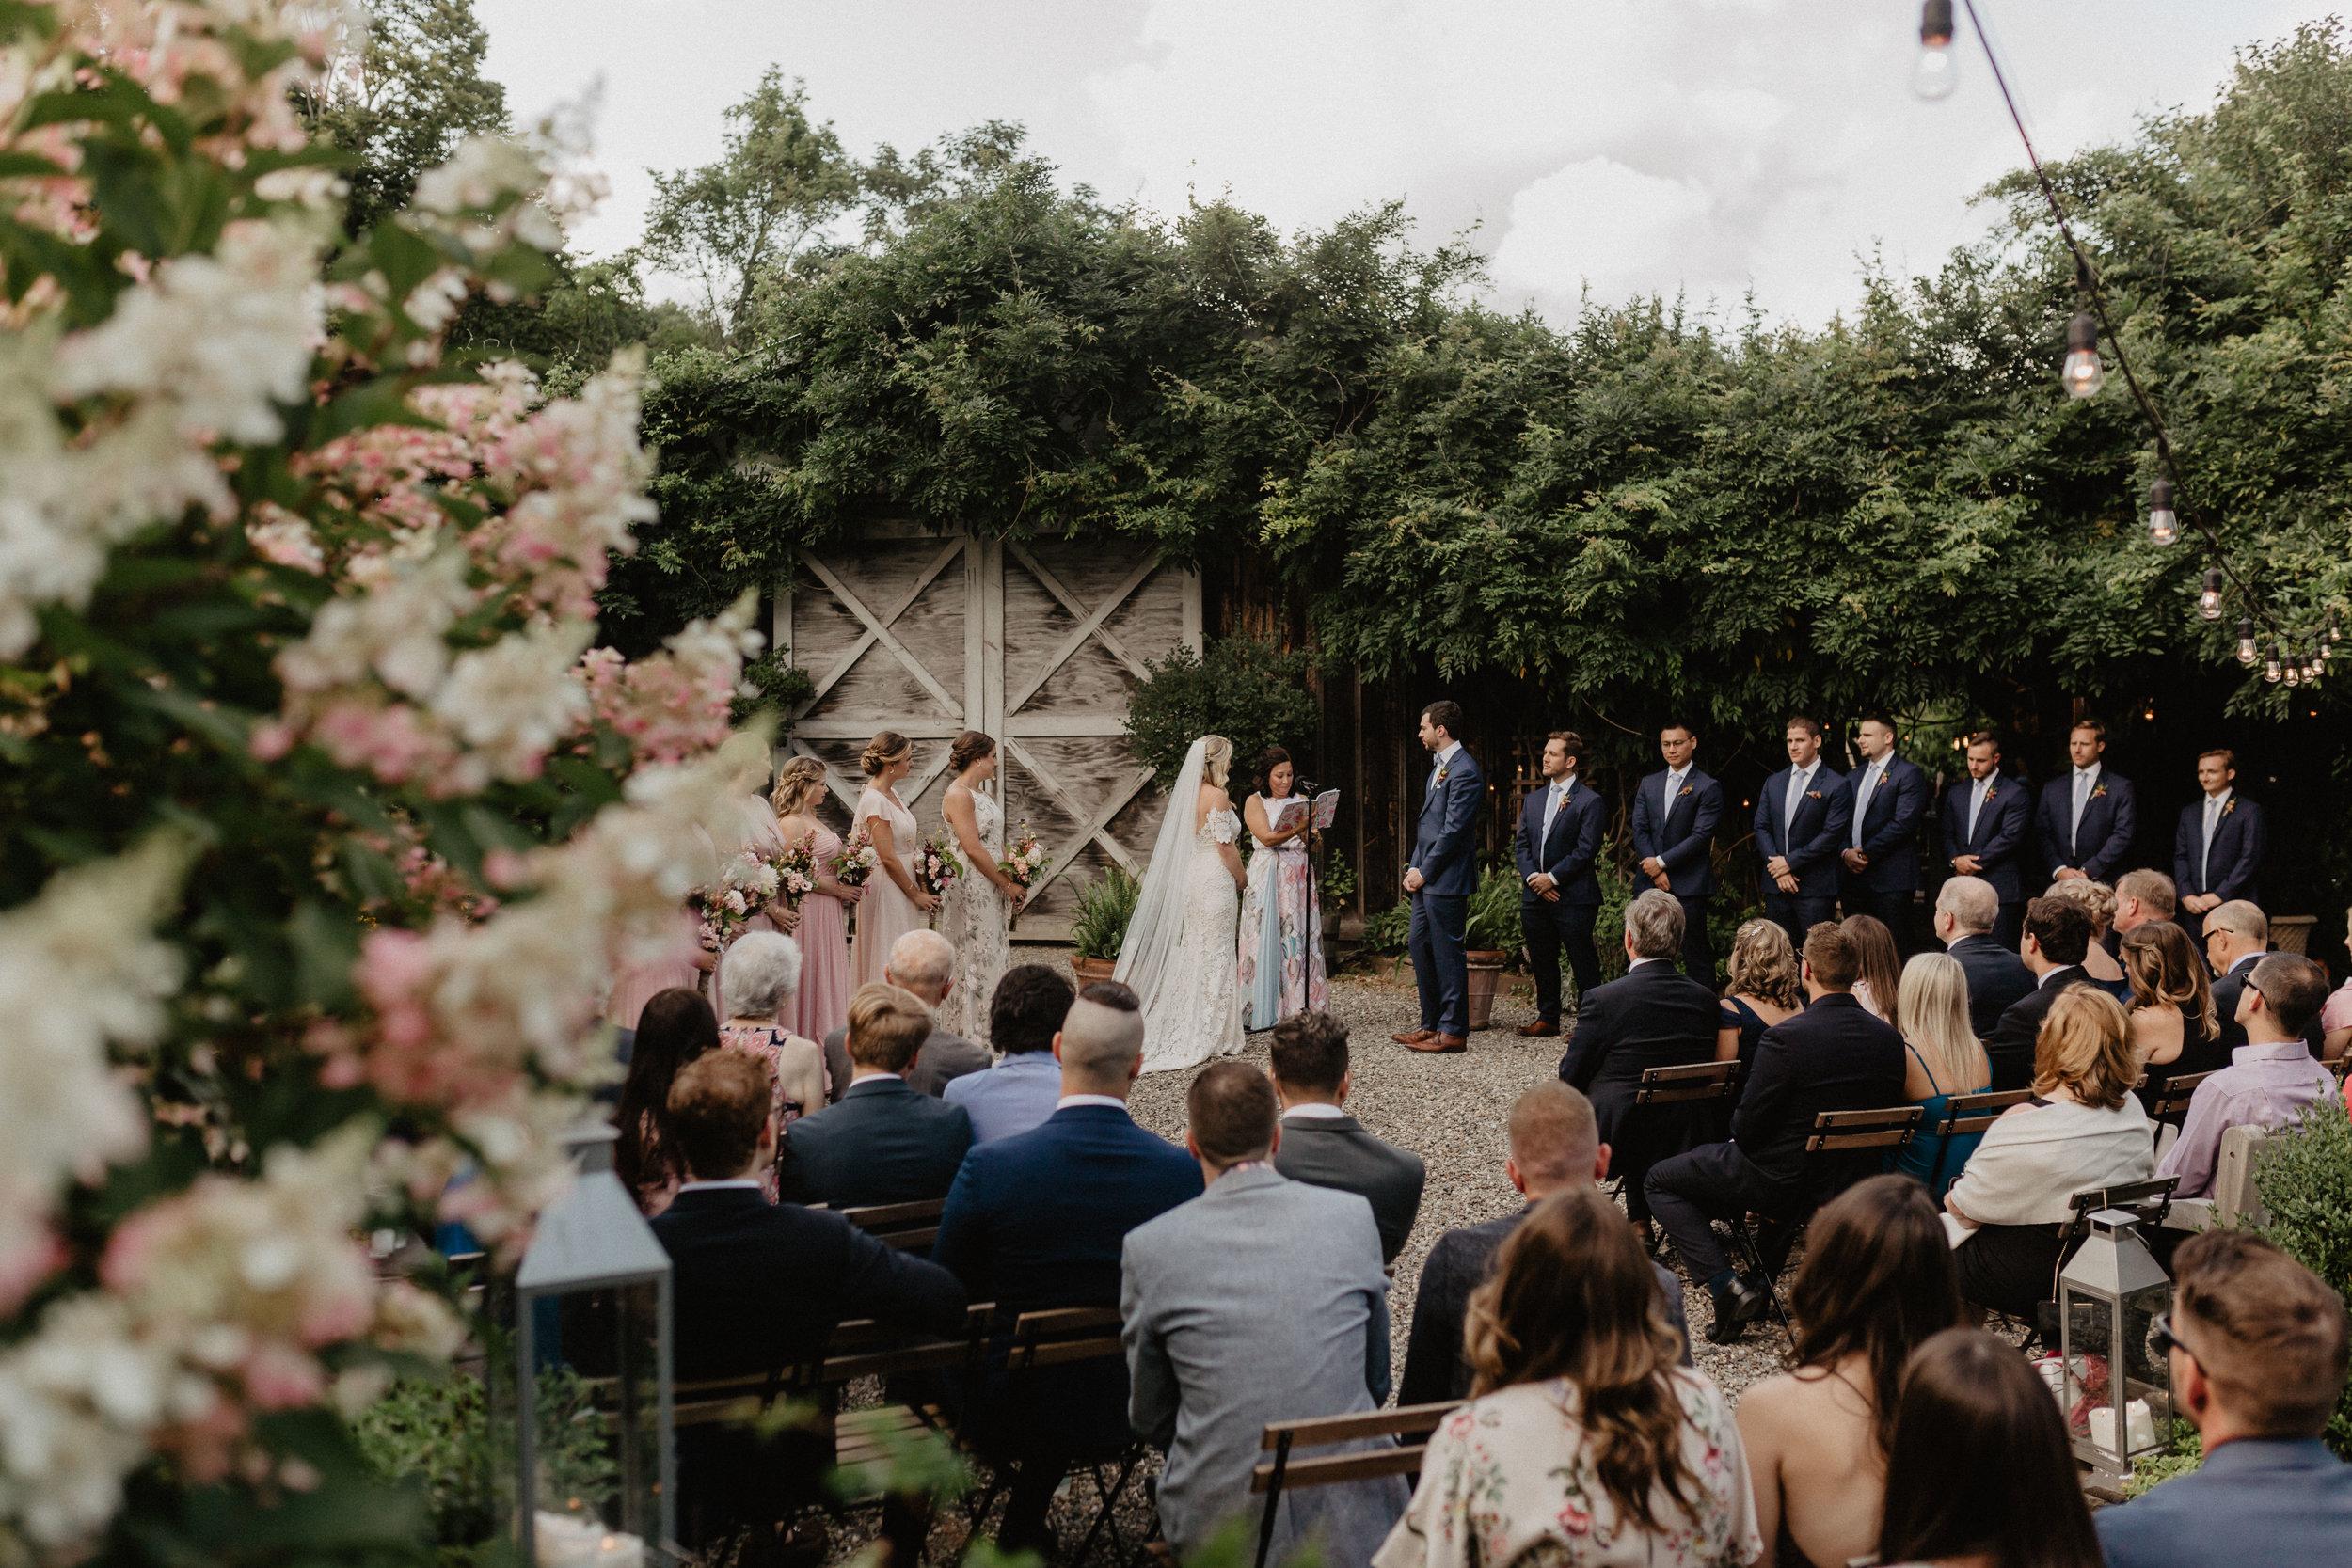 m-and-d-farm-wedding-65.jpg